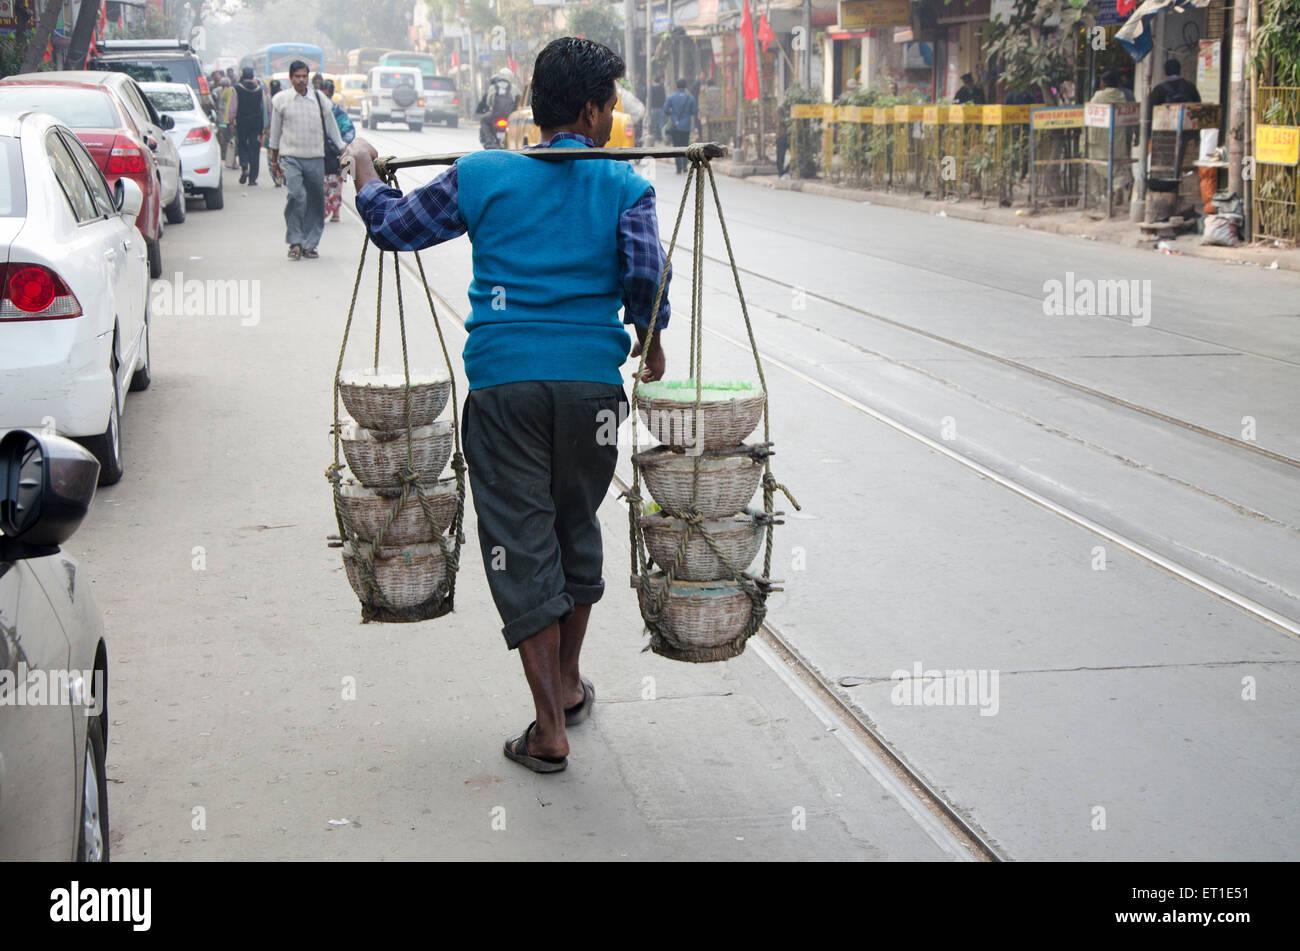 Hombre llevando comida material en Kaavad Kolkata Bengala Occidental, India Asia Imagen De Stock